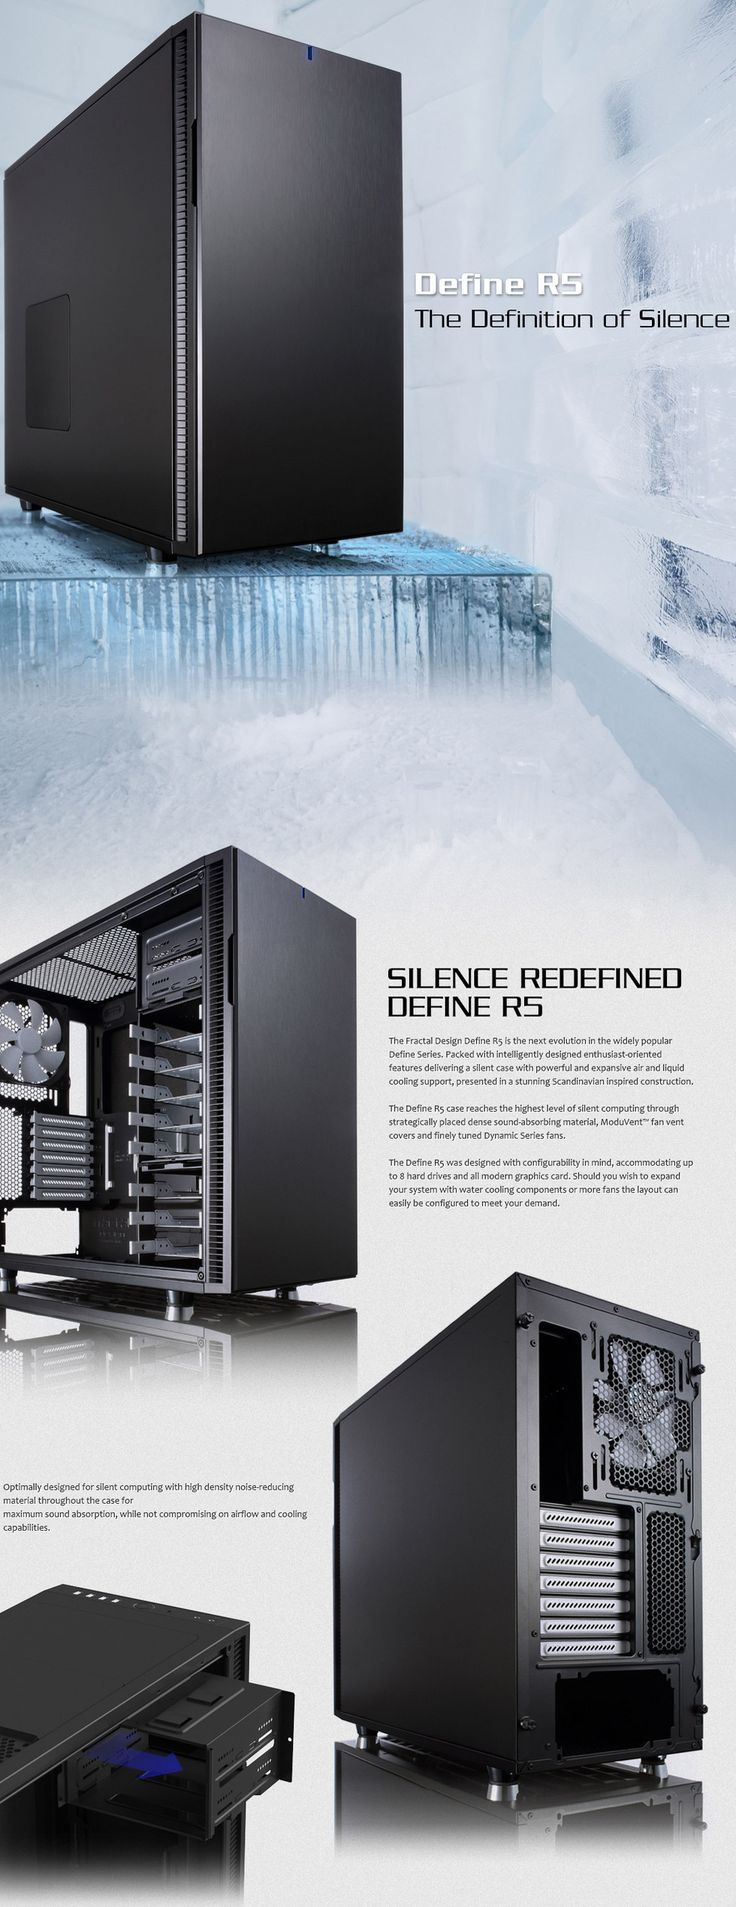 Fractal Design Define R5 Mid Tower Titanium [FD-CA-DEFR5-TI] : PC Case Gear